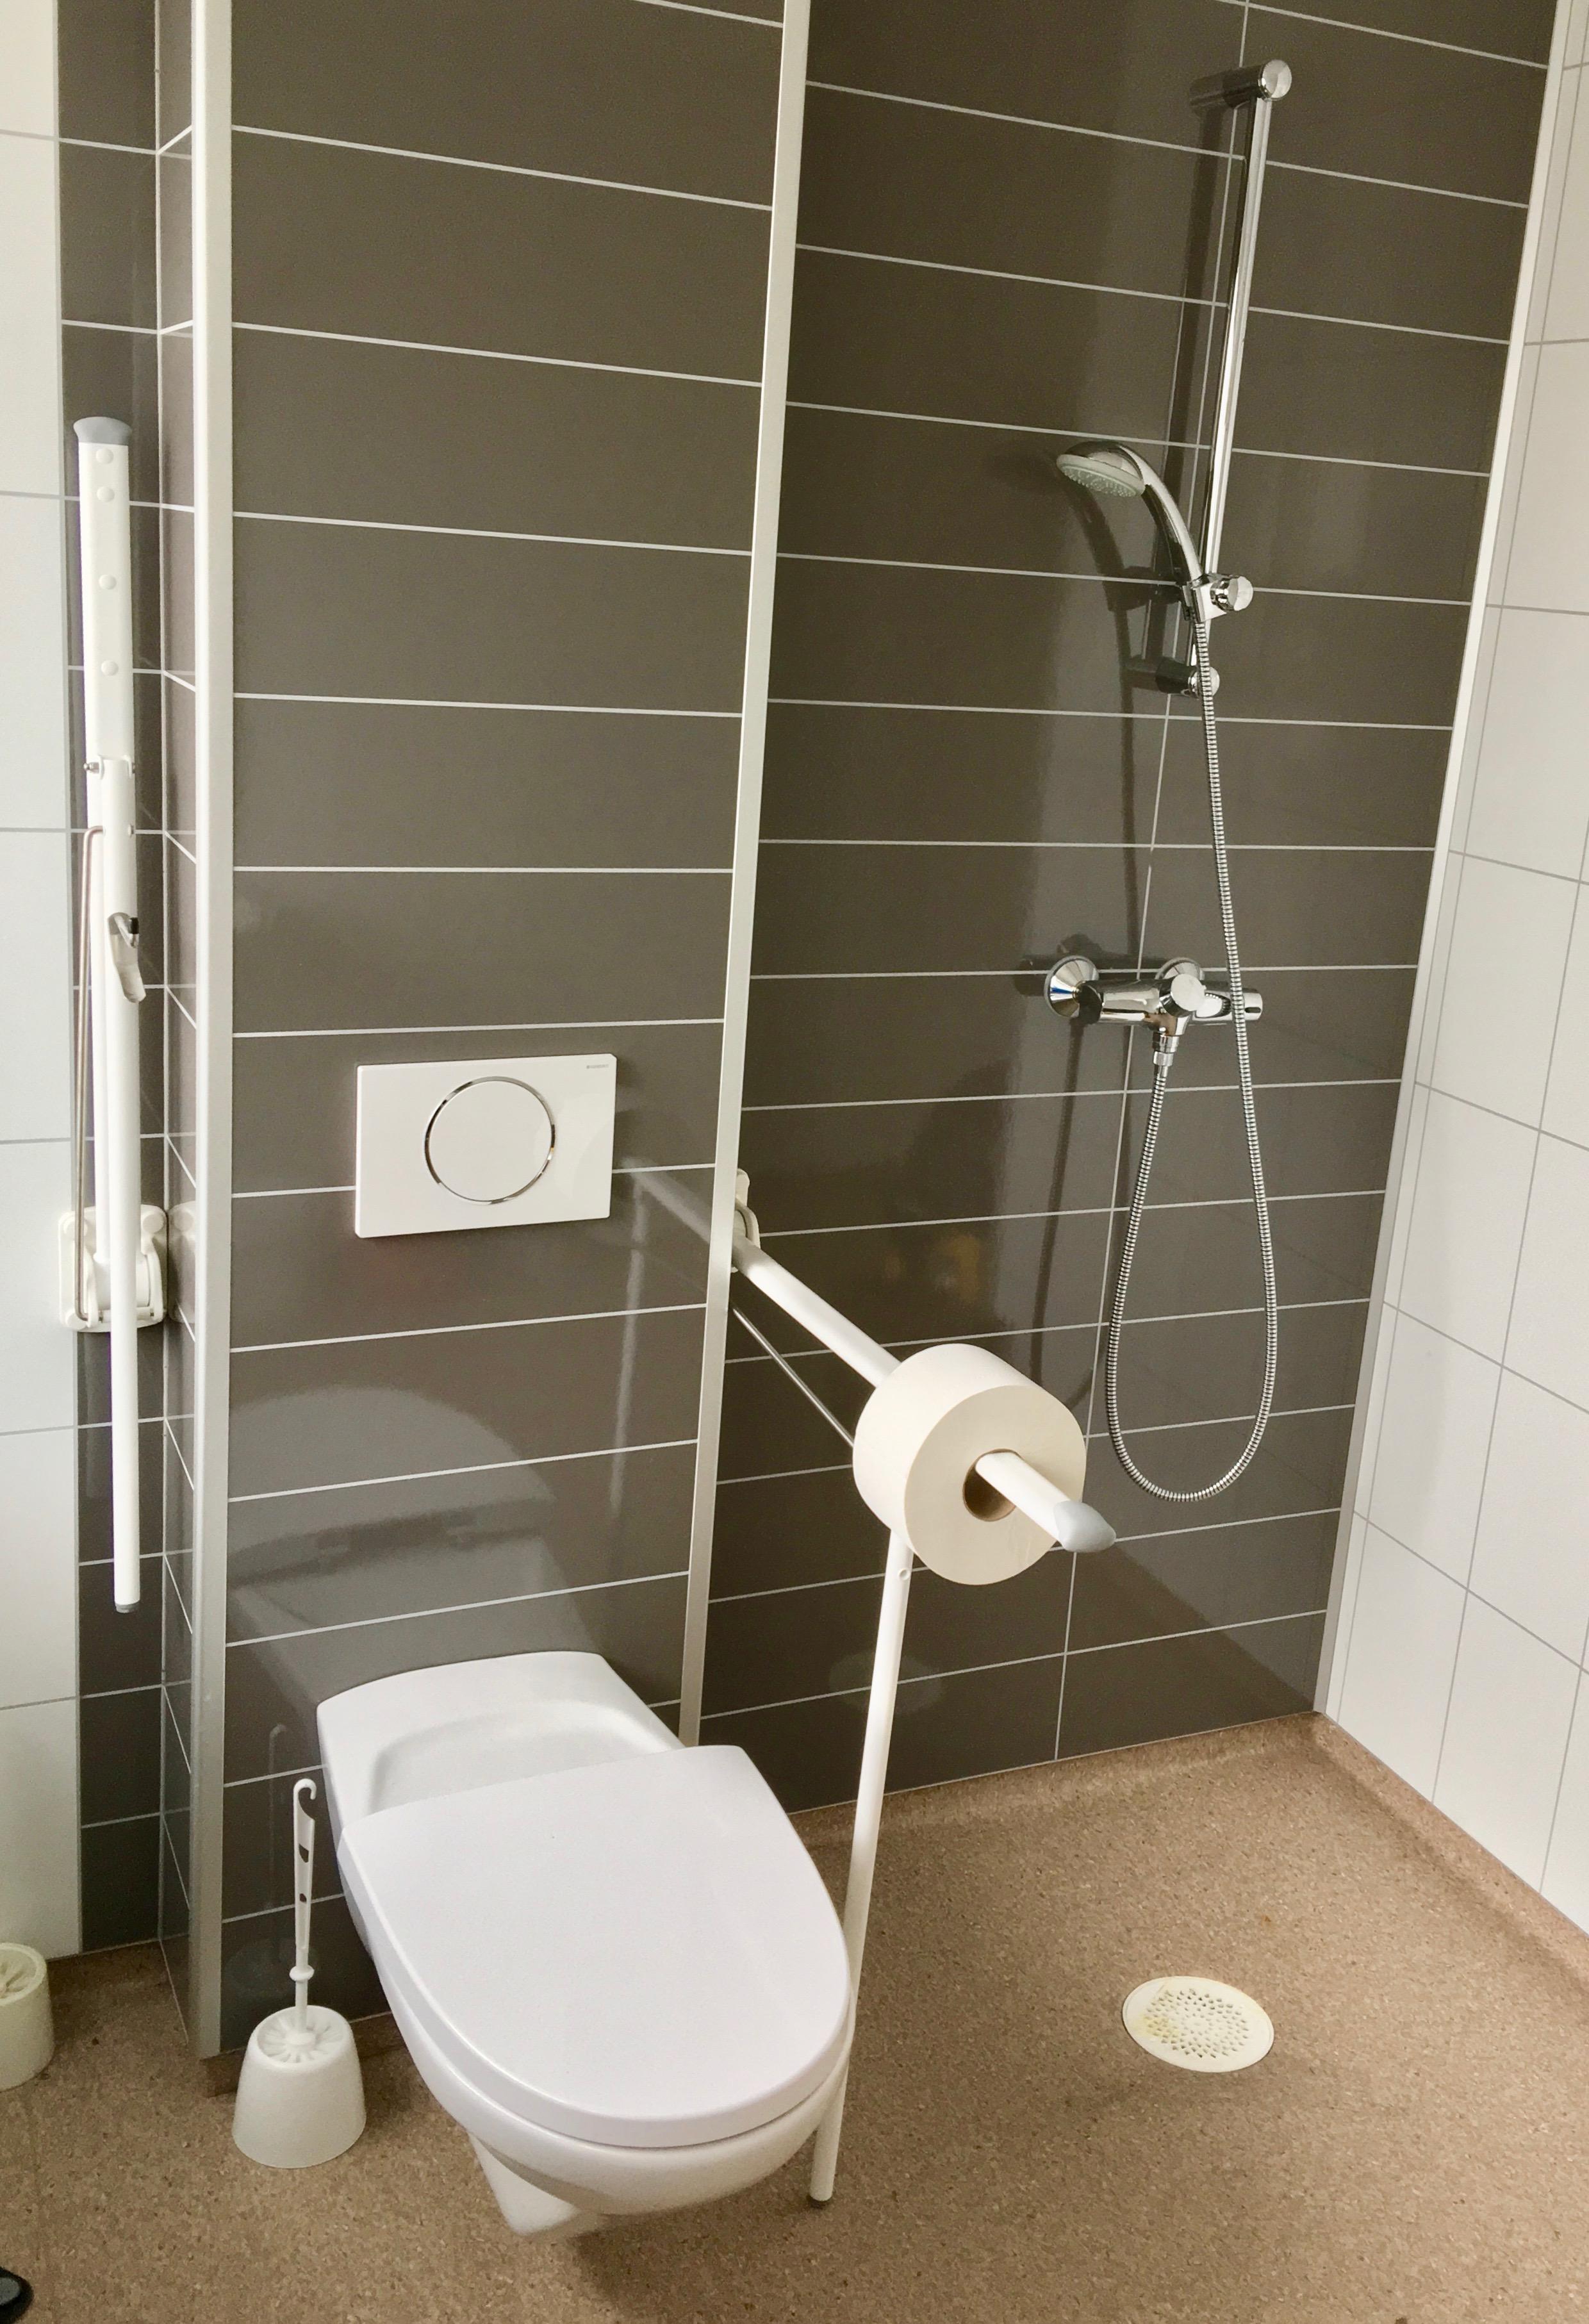 File:Toilet, shower, etc. in School in Stord, Norway 2018-03-14 E ...